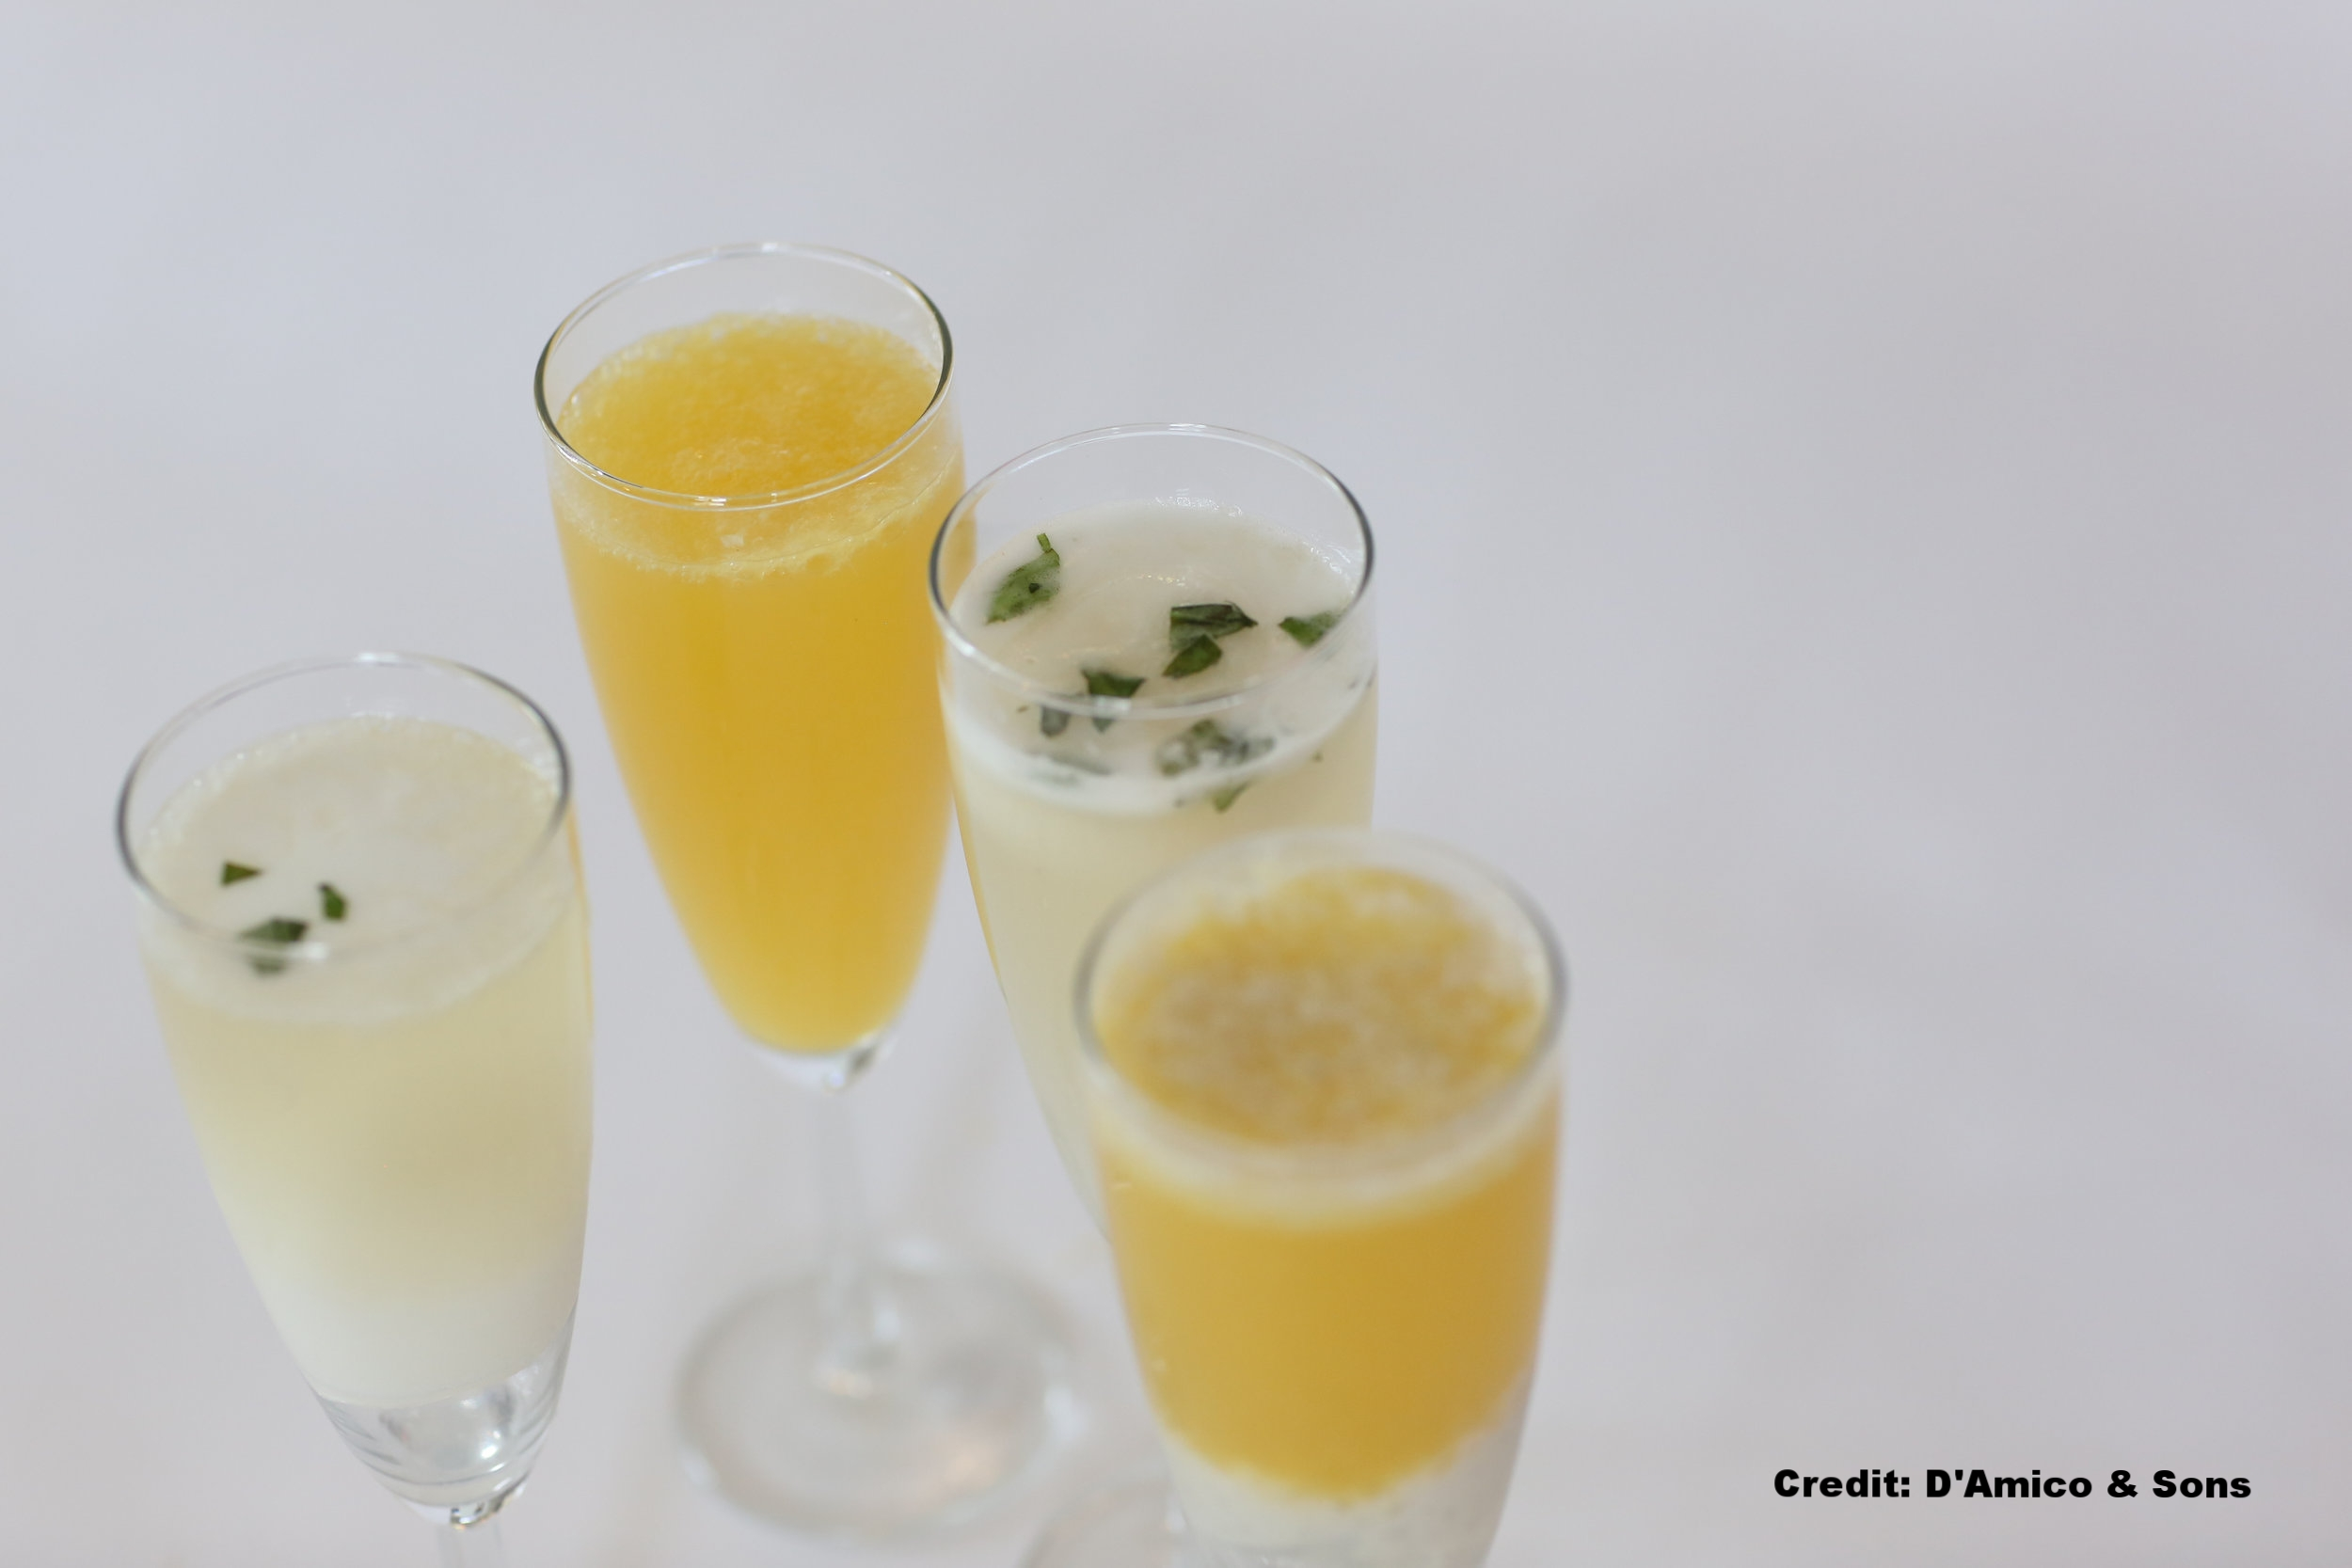 Mimosa, orange cream mimosa and Sgroppino, a house-made basil lemonade champagne spritz with Izzy's lemon basil sorbetto.jpg